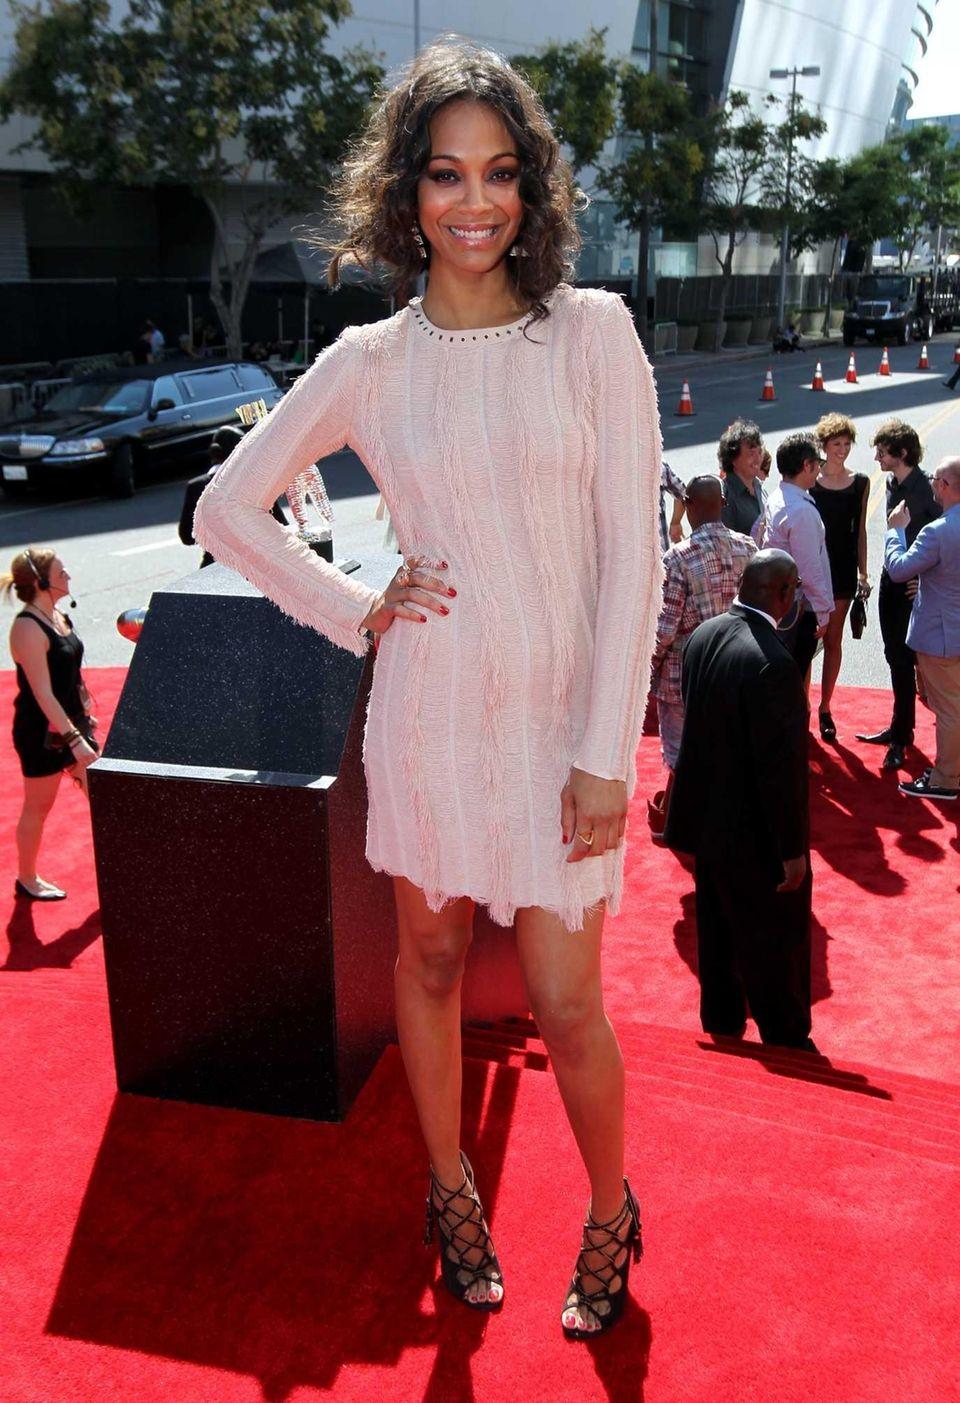 Zoe Saldana arrives at the MTV Video Music